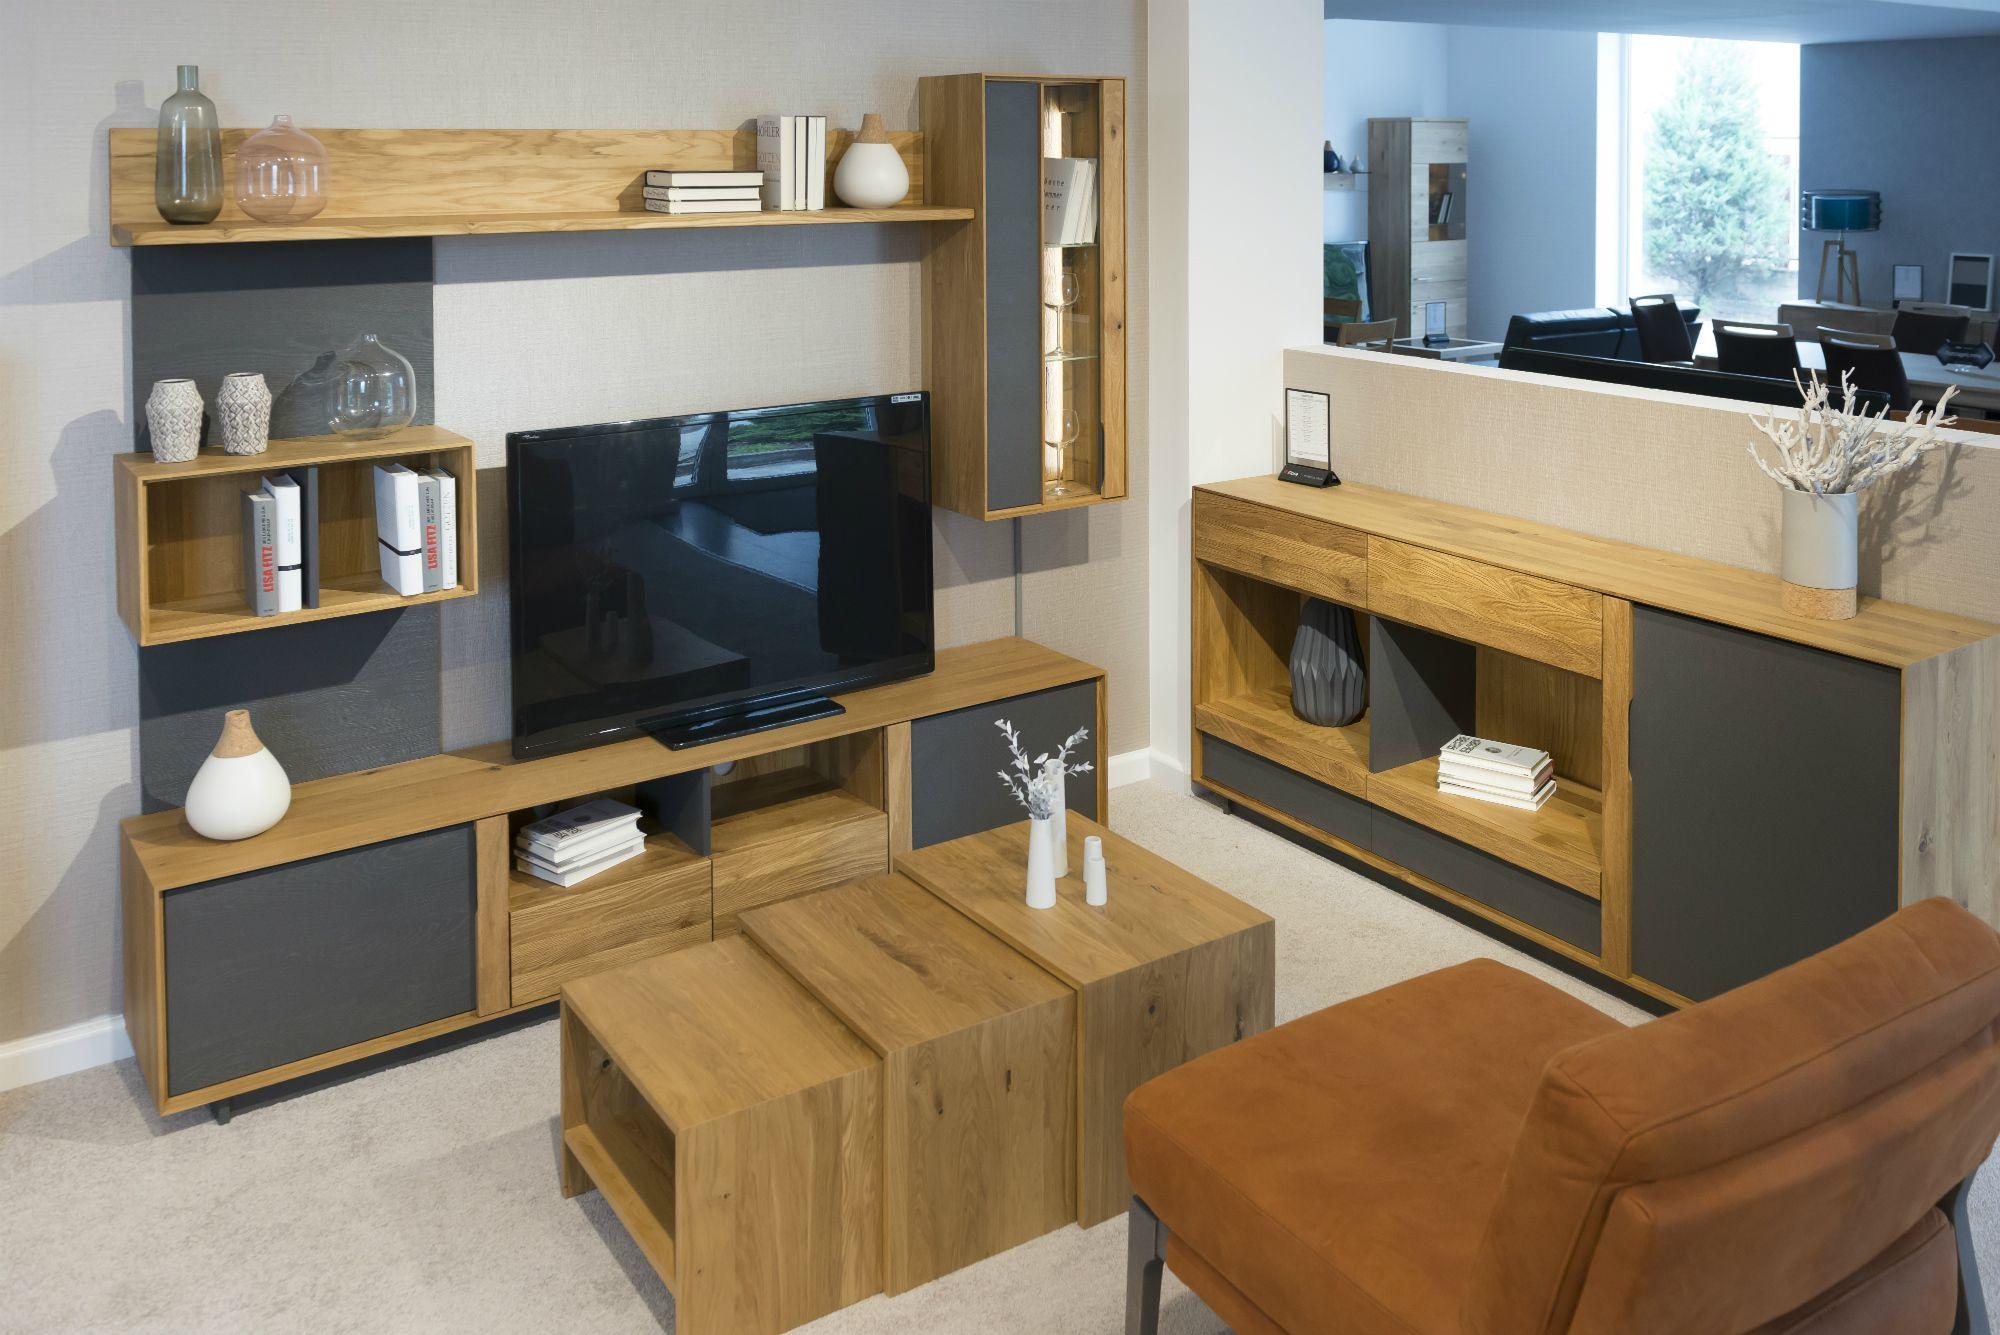 Woodline Home Concept Livingroom Interior Idea From Klose Kloseshowroom Livingroom Woodenfurniture Naturalmaterials